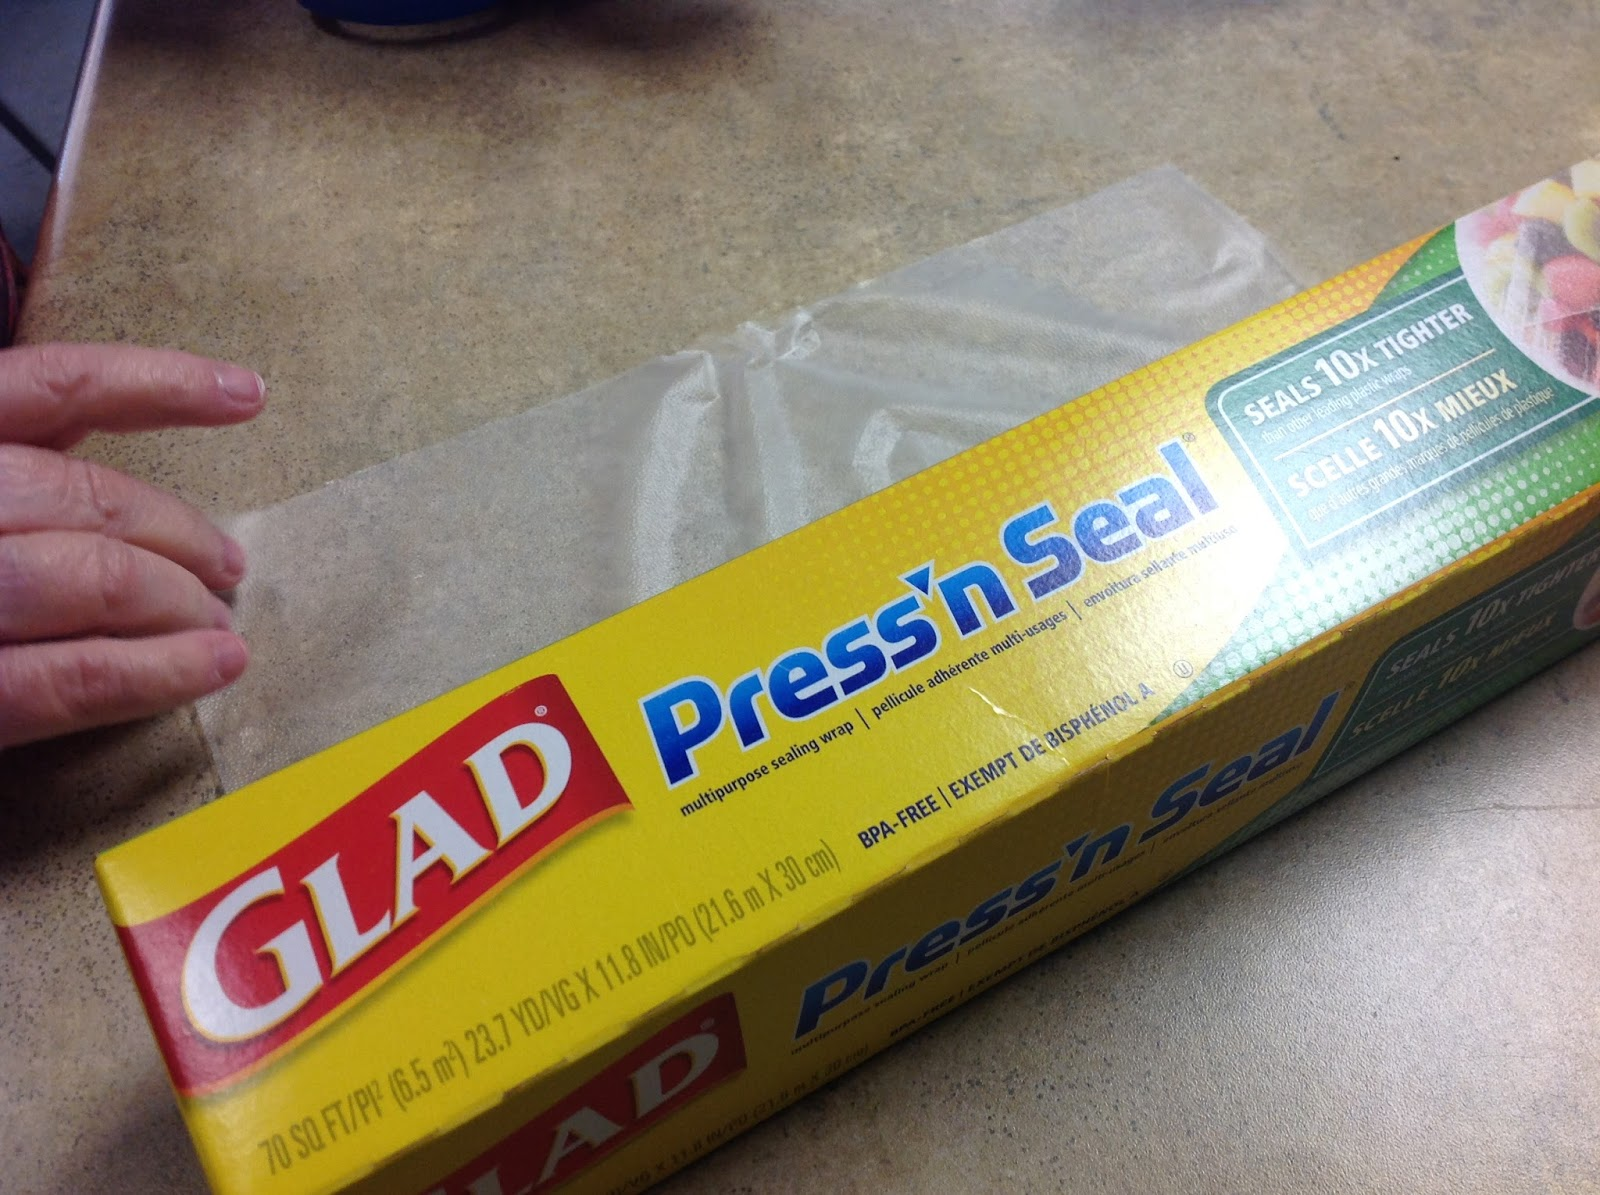 Press and Peel a new Bra